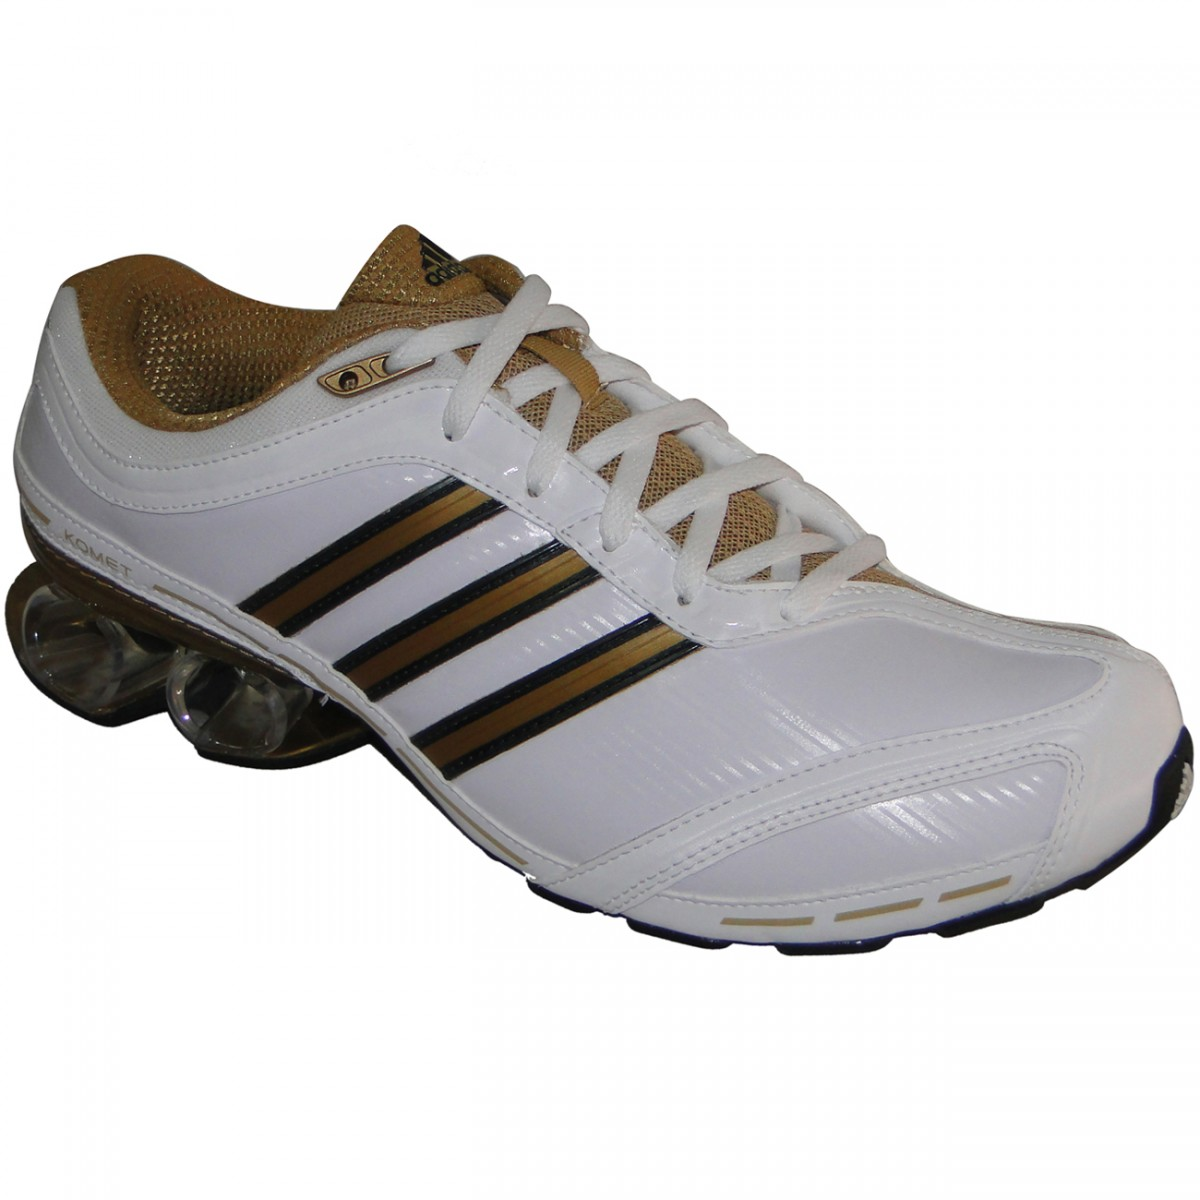 Tênis Adidas Komet M 9190 - BRANCO DOURADO - Chuteira Nike acbc75a09d359